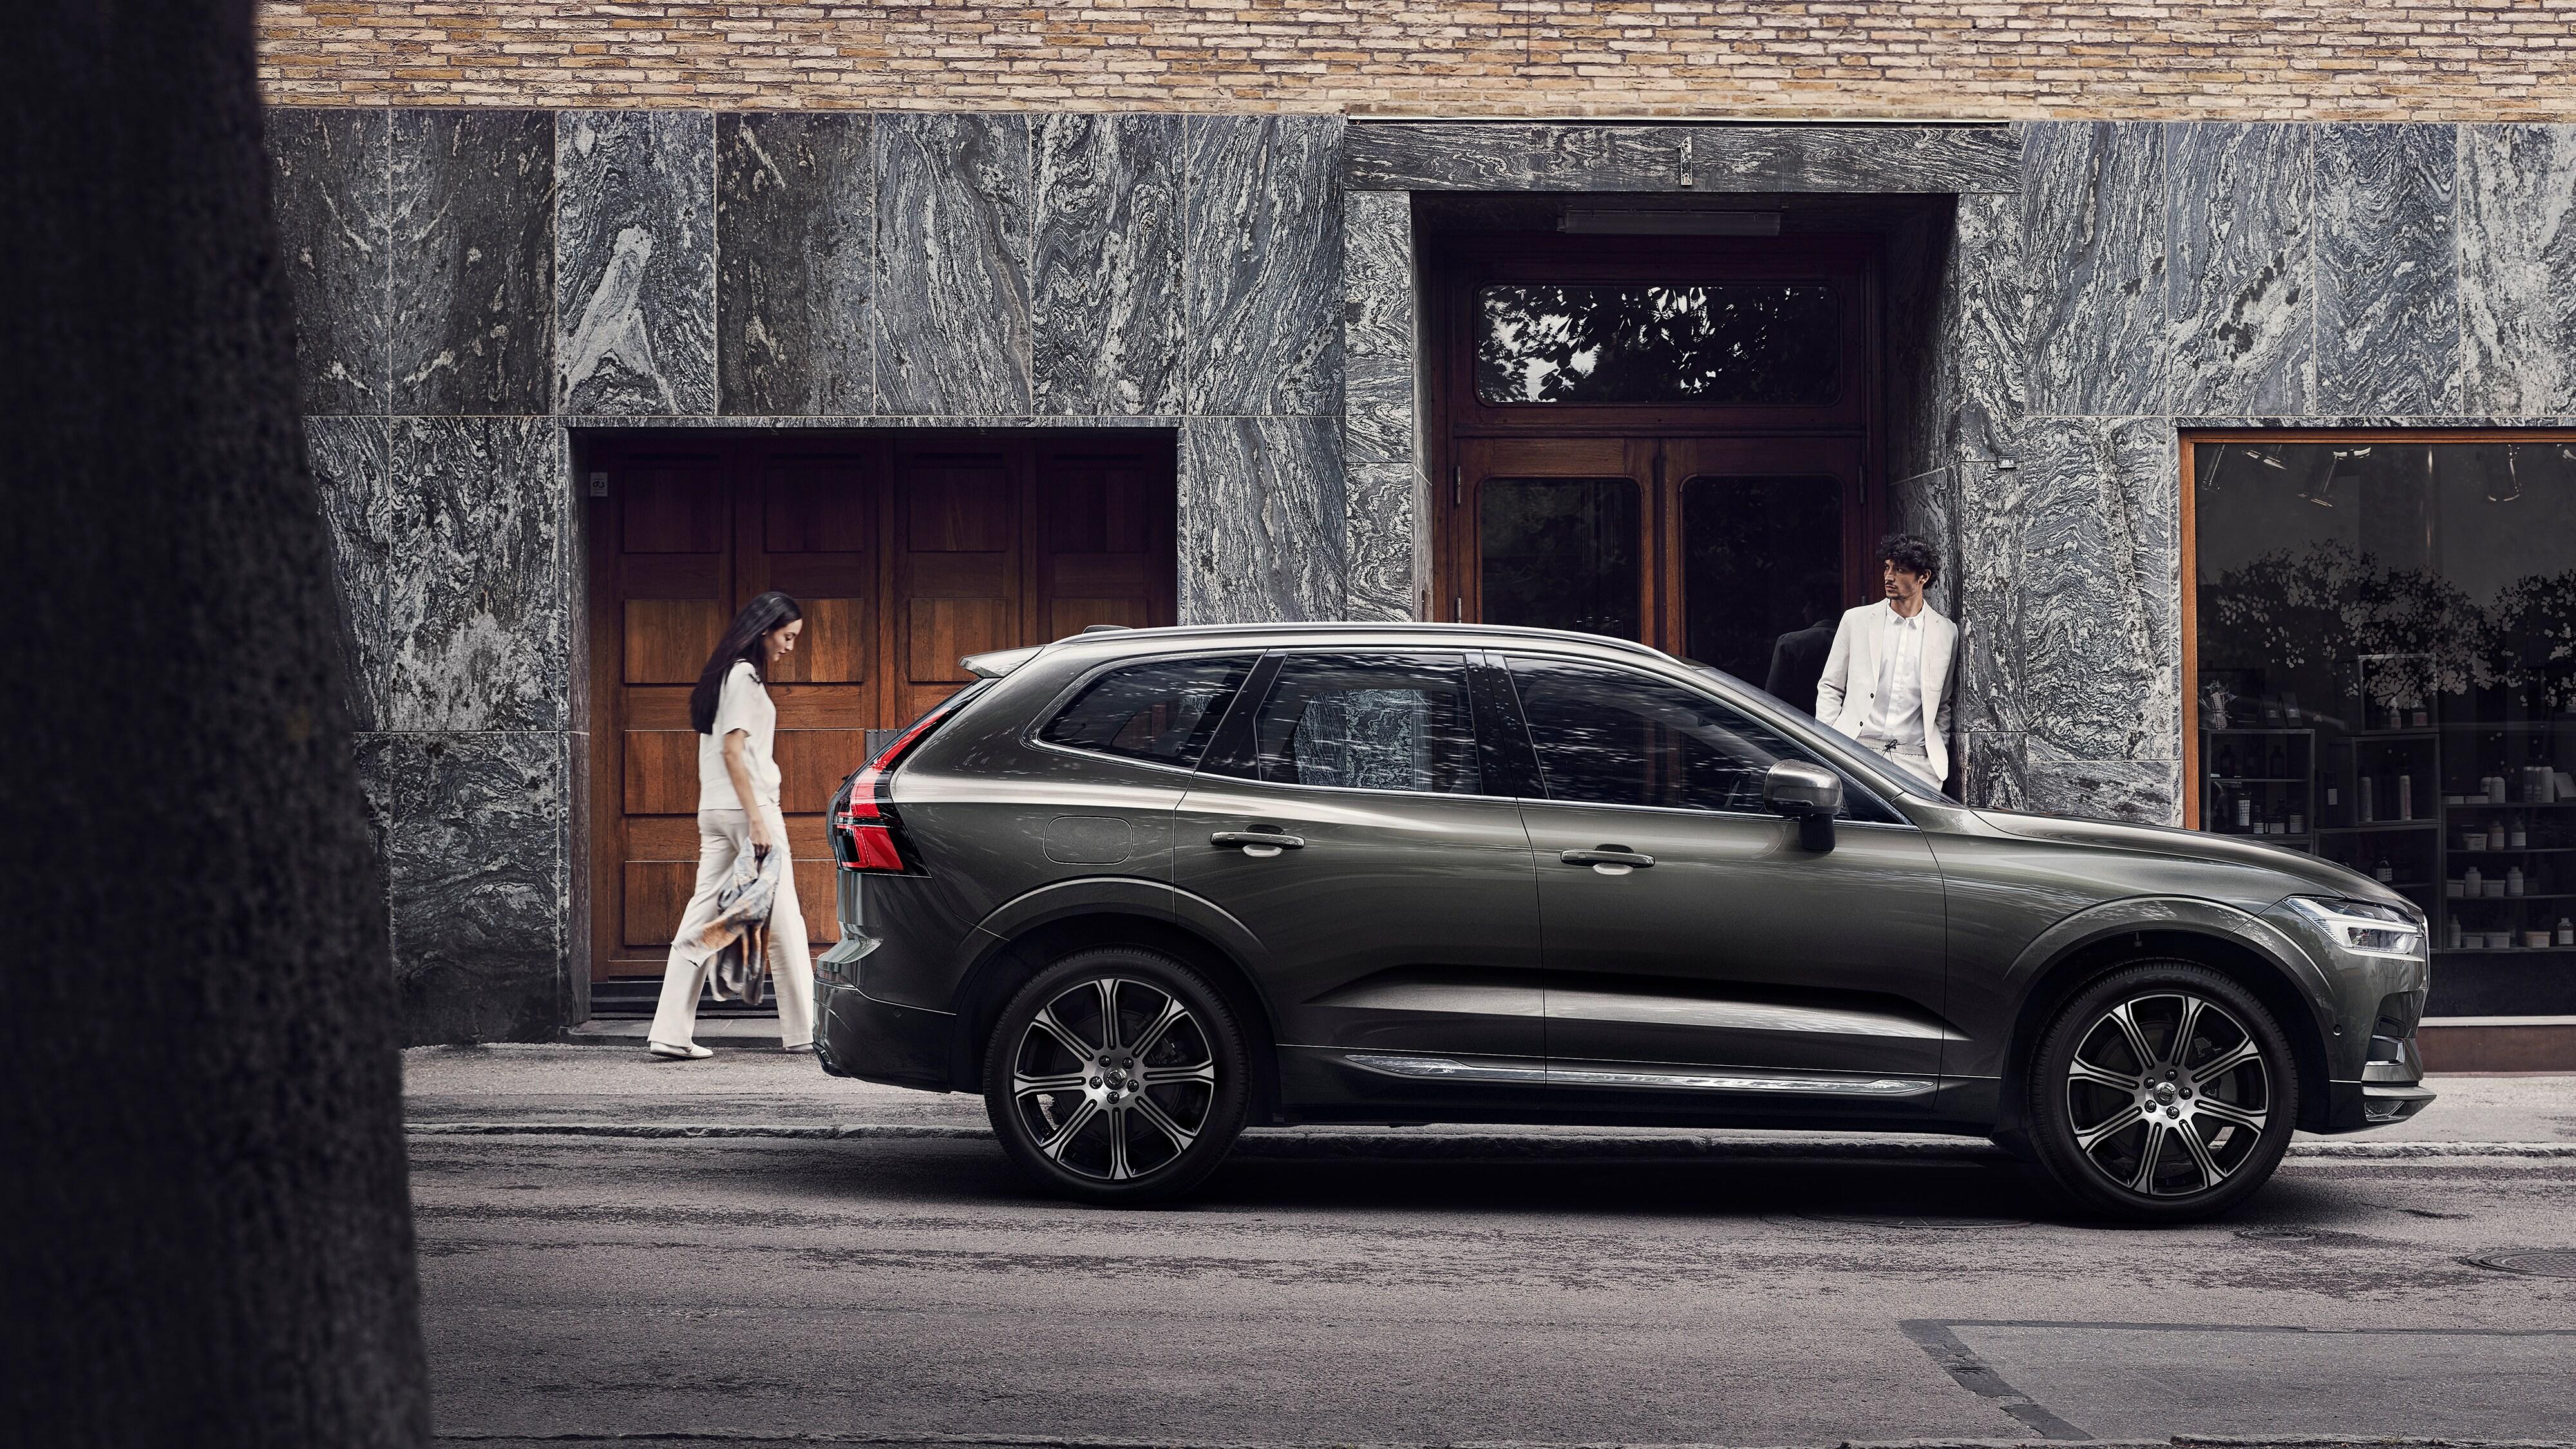 Volvo XC60 | Crossover SUV | Volvo Cars